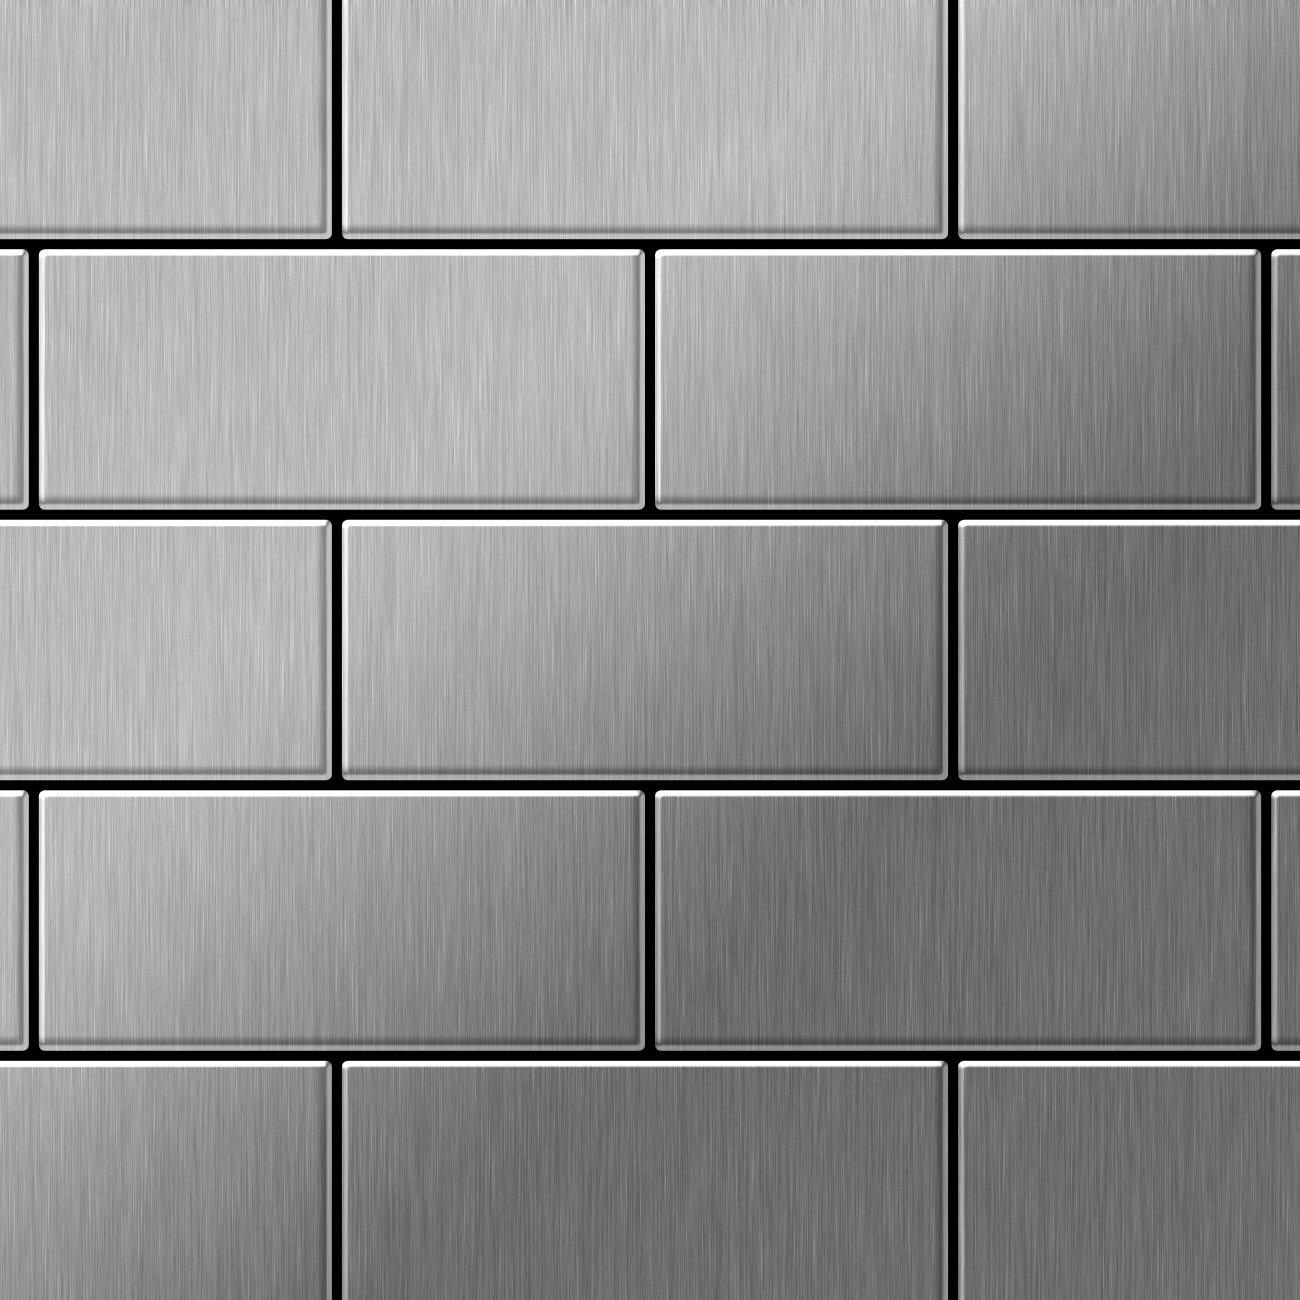 Mosaik Fliese massiv Metall Edelstahl gebrstet in grau 16mm stark ALLOY SubwaySSB 058 m2